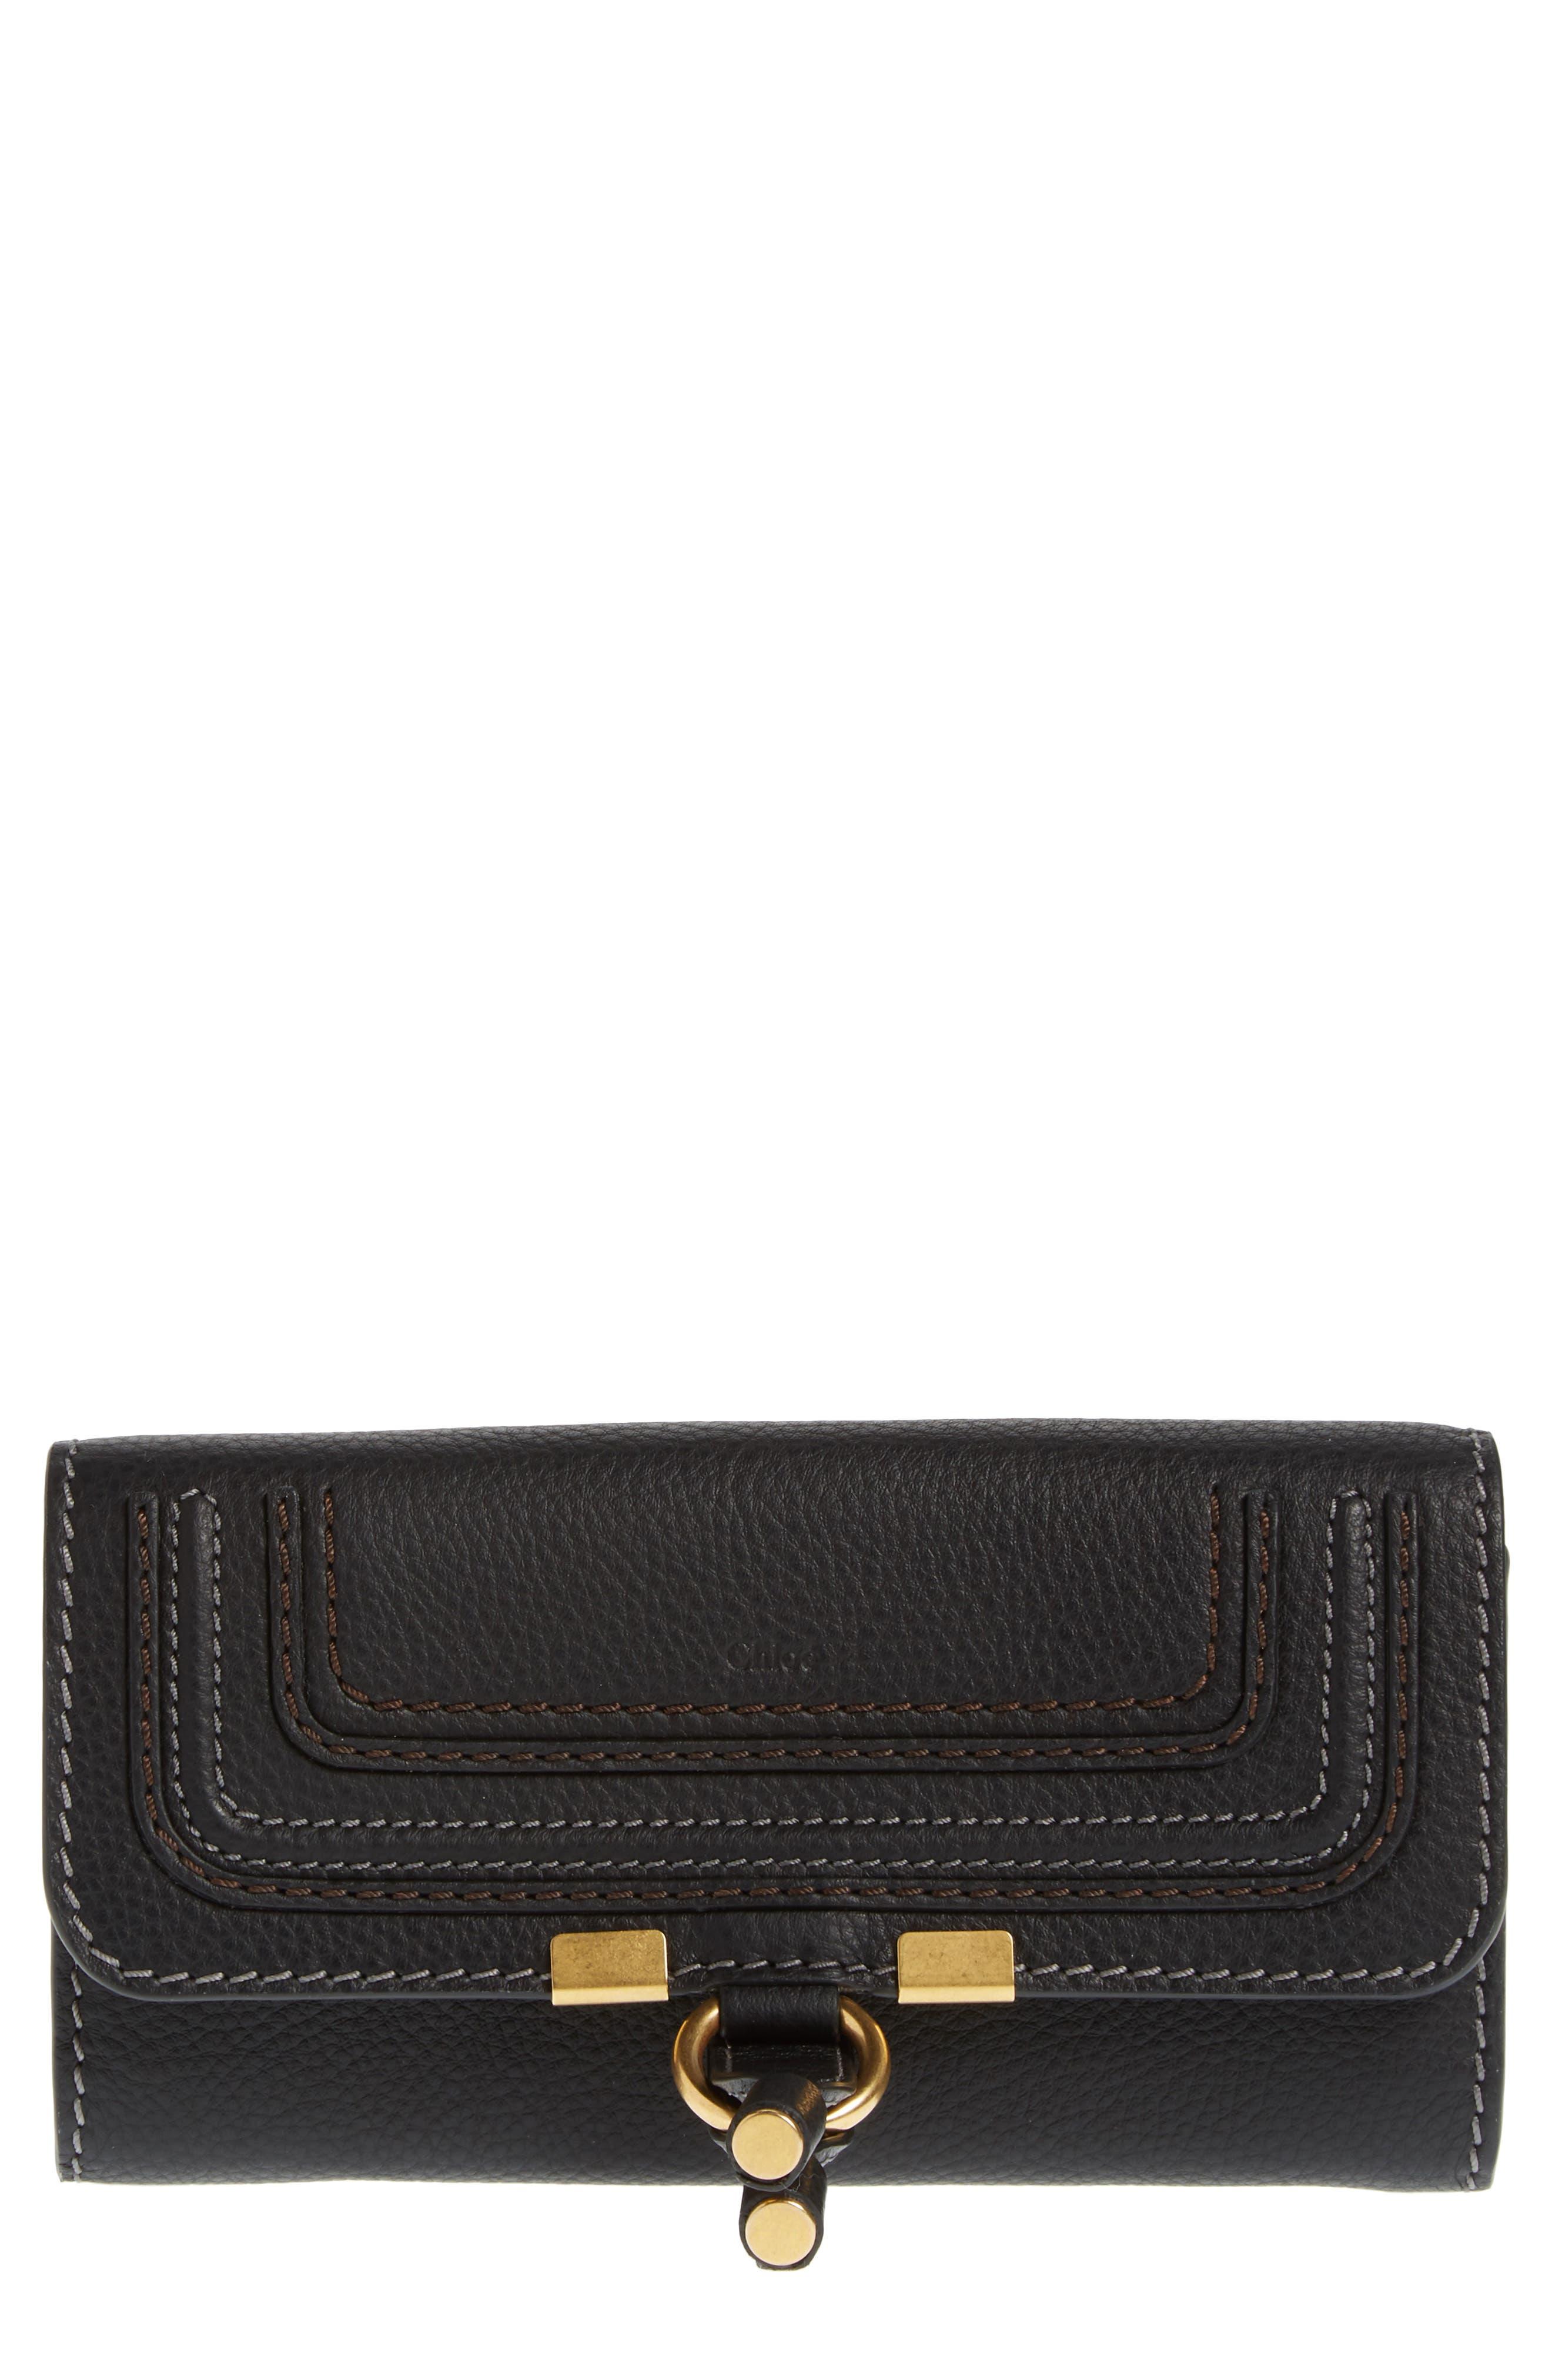 Marcie - Long Leather Flap Wallet,                         Main,                         color, BLACK